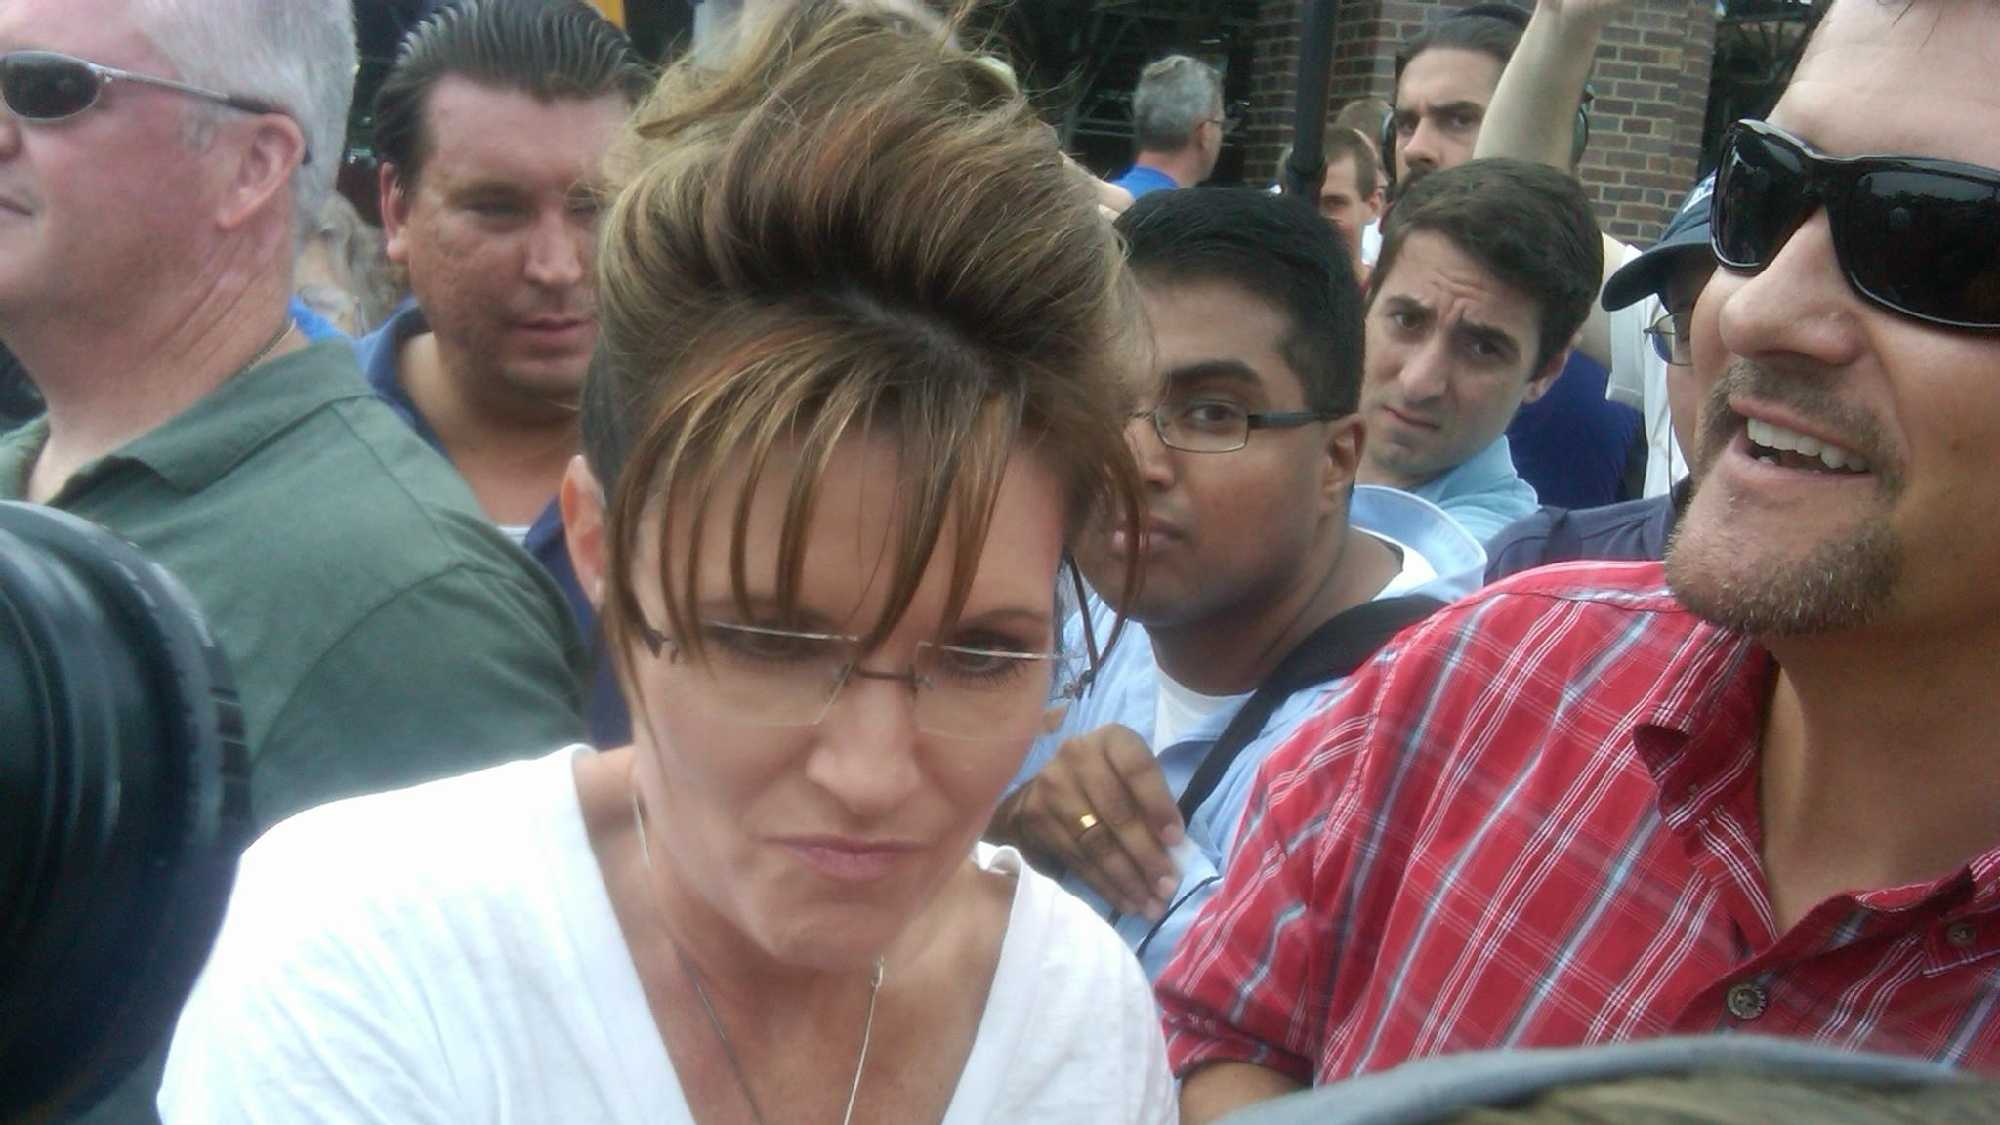 Sarah Palin at Iowa State Fair